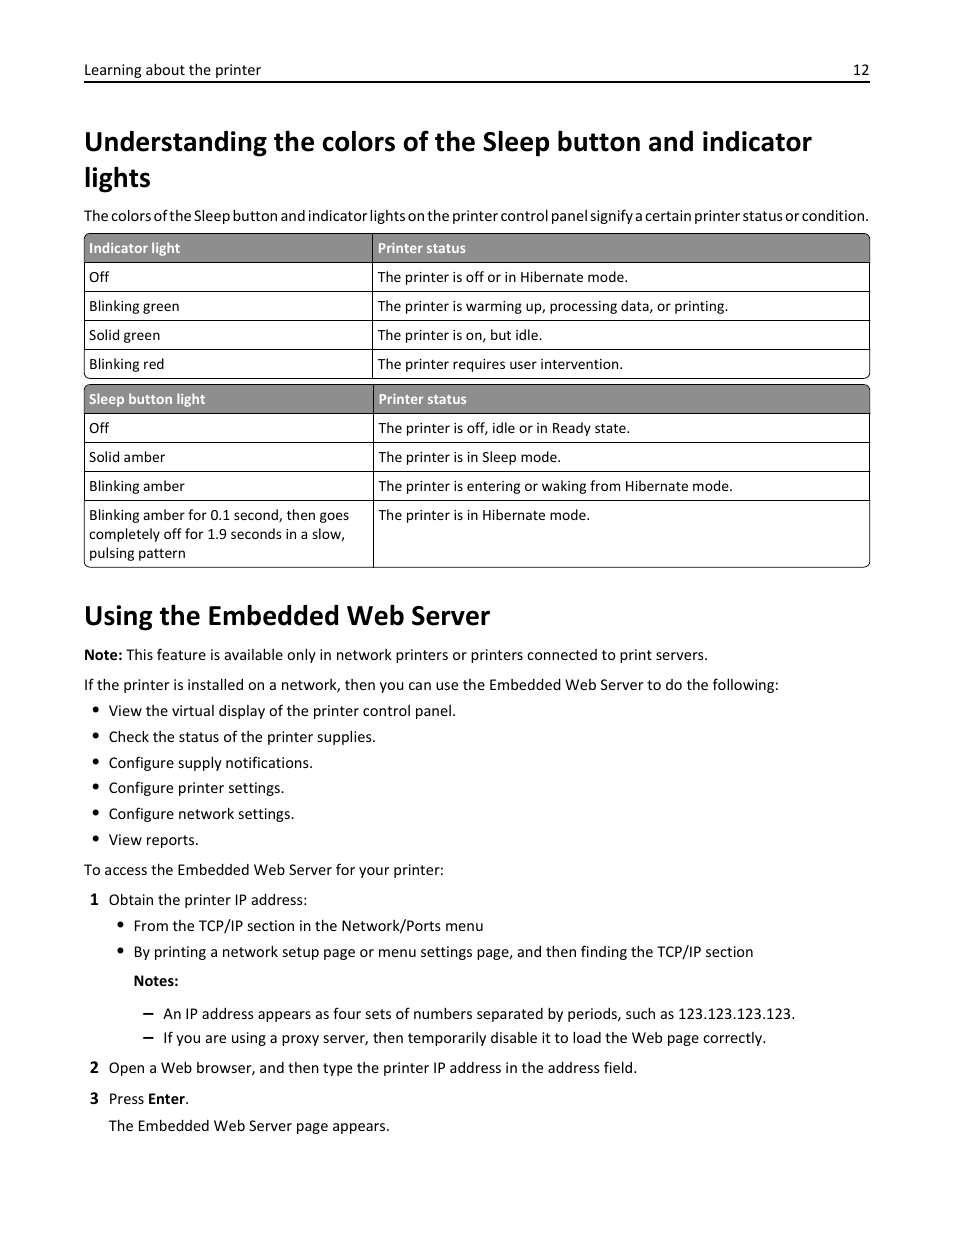 Using the embedded web server | Dell B2360dn Mono Laser Printer User